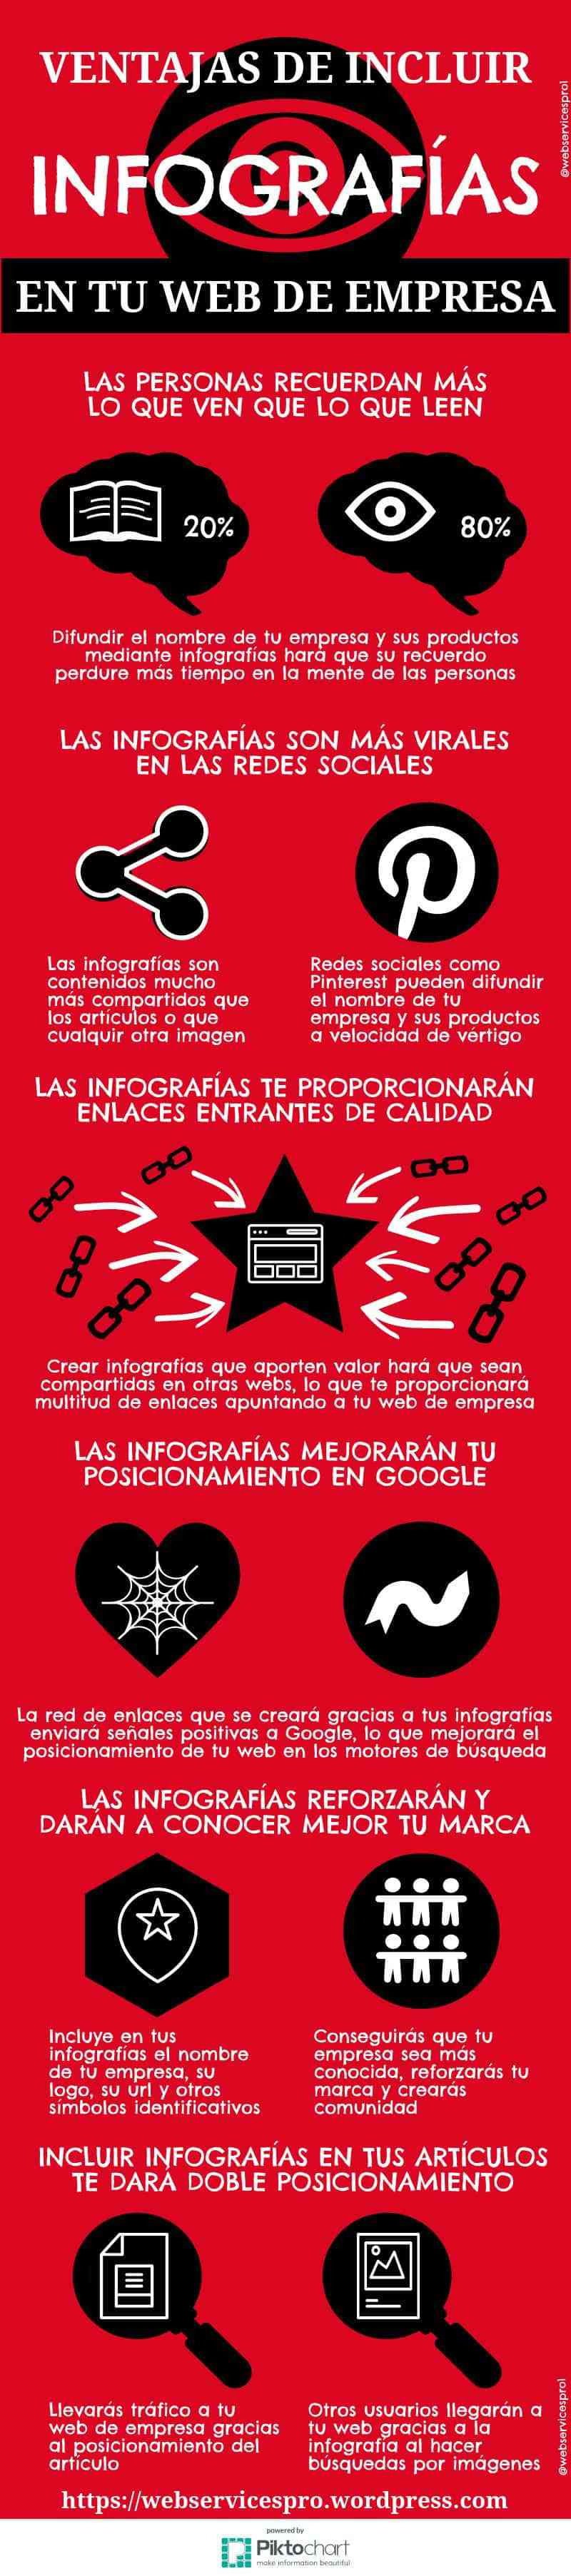 Ventajas de incluir infografías en tu blog de empresa #infografia #infographic #marketing